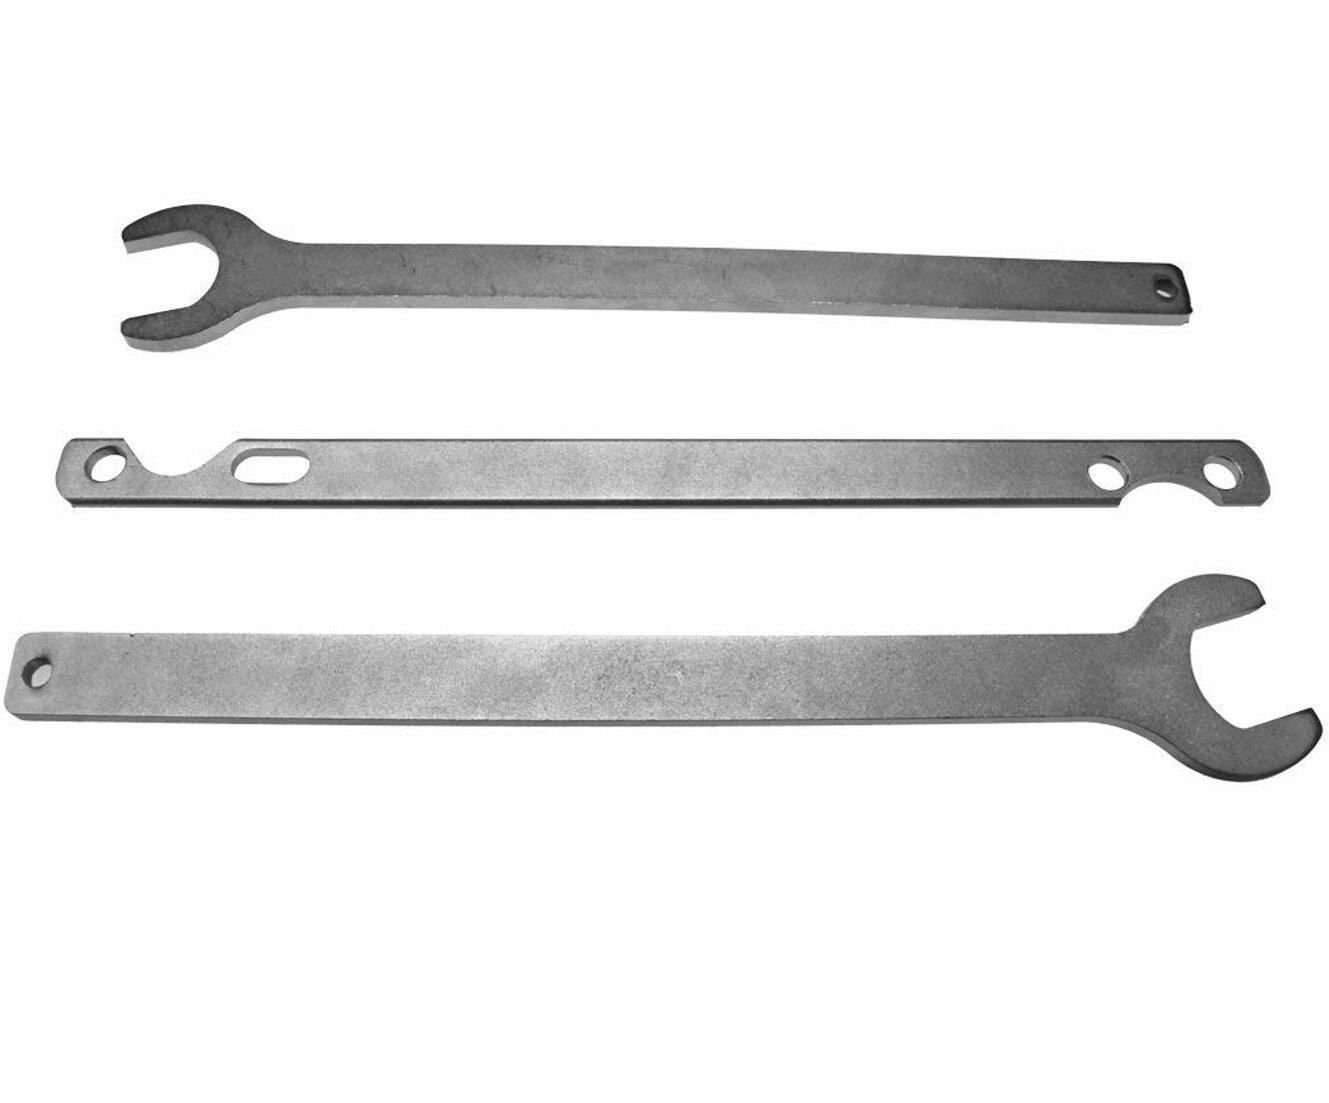 DiER 3pcs Water Pump Holder Removal Tool Kit 32 & 36mm Spanner Set